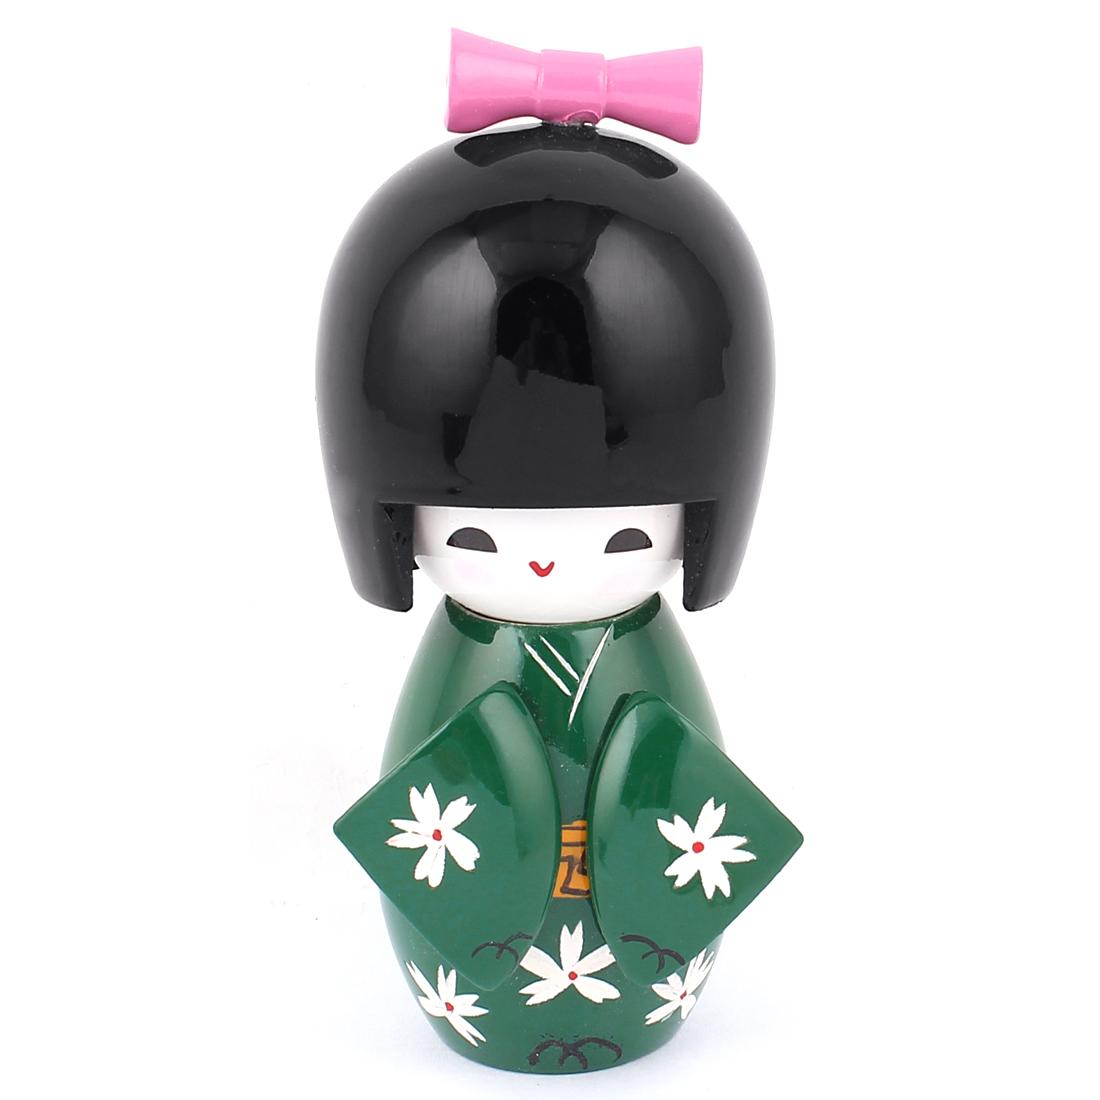 Dark Green Wooden Flower Print Japanese Kimono Kokeshi Doll Ornament